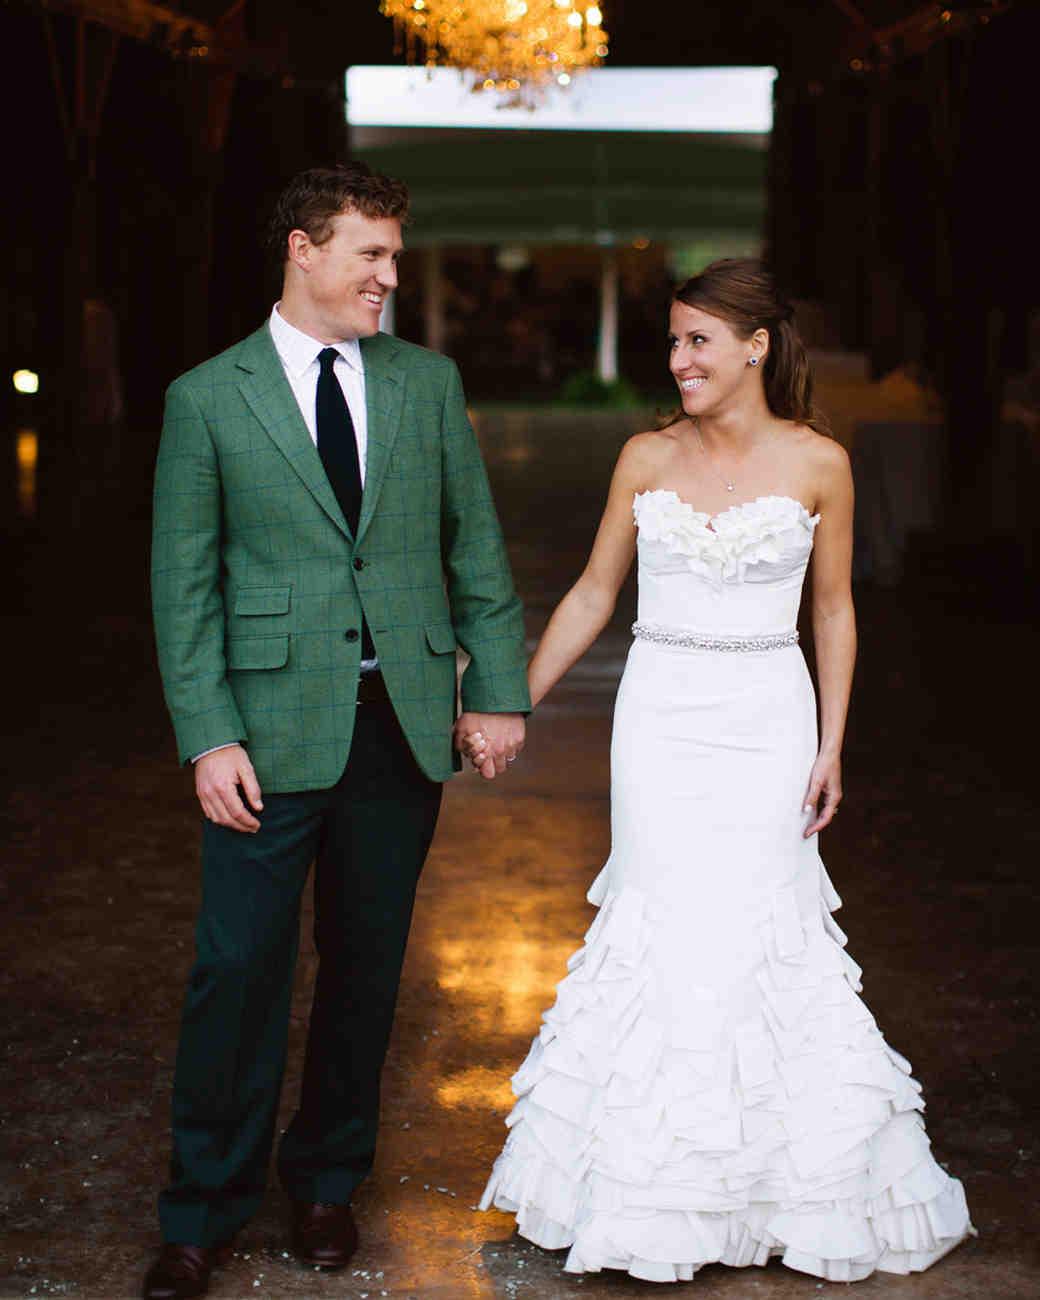 Wedding dress etiquette